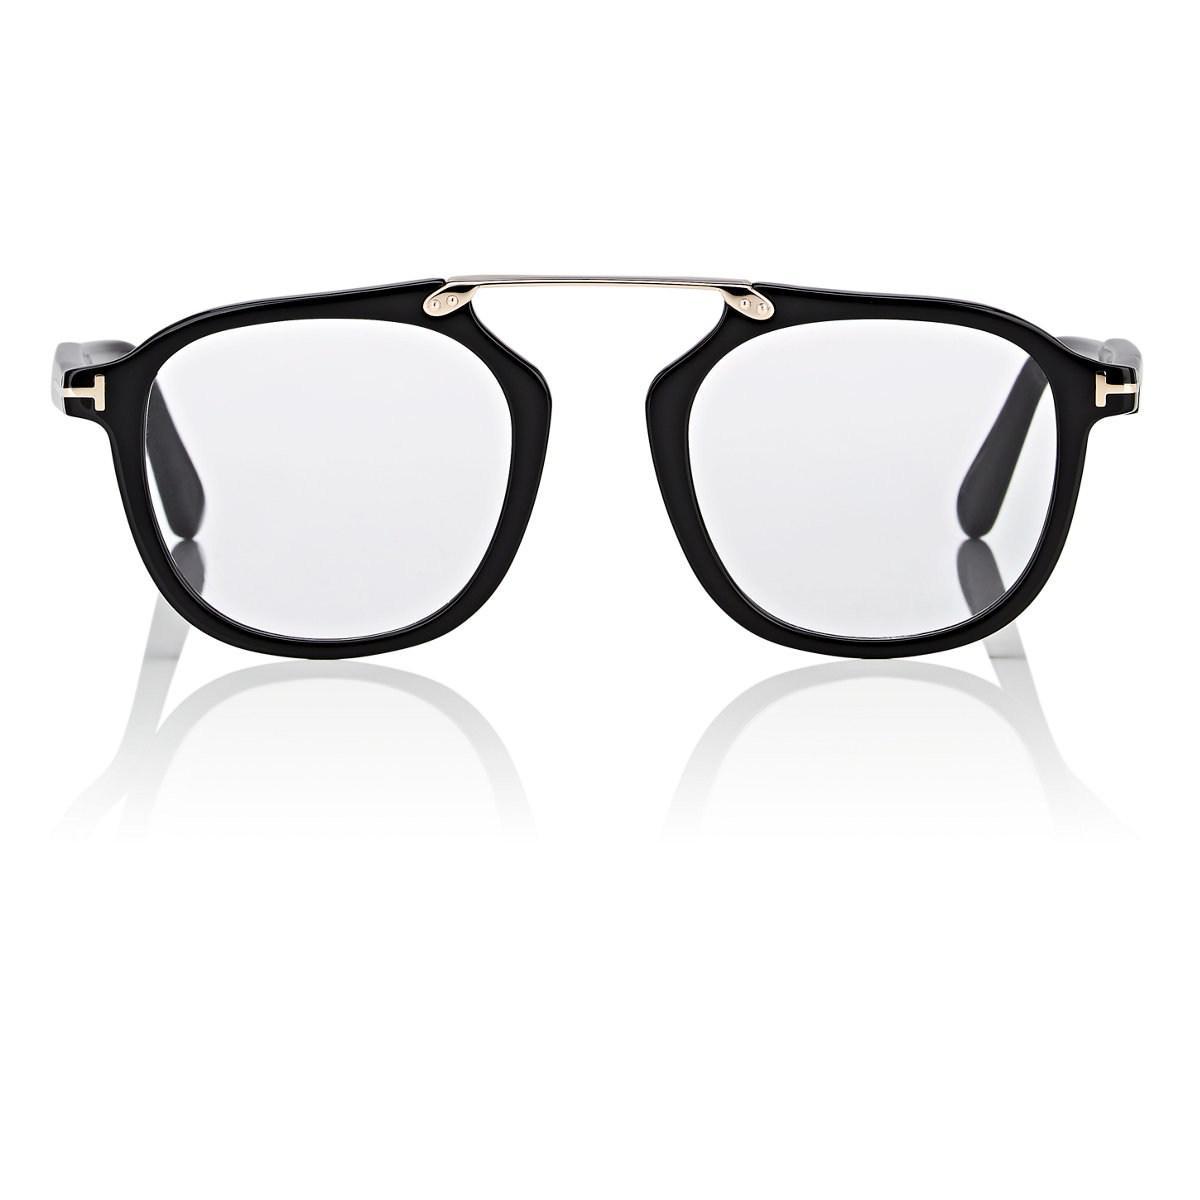 f4727fa605 Lyst - Tom Ford Tf5495 Eyeglasses in Black for Men